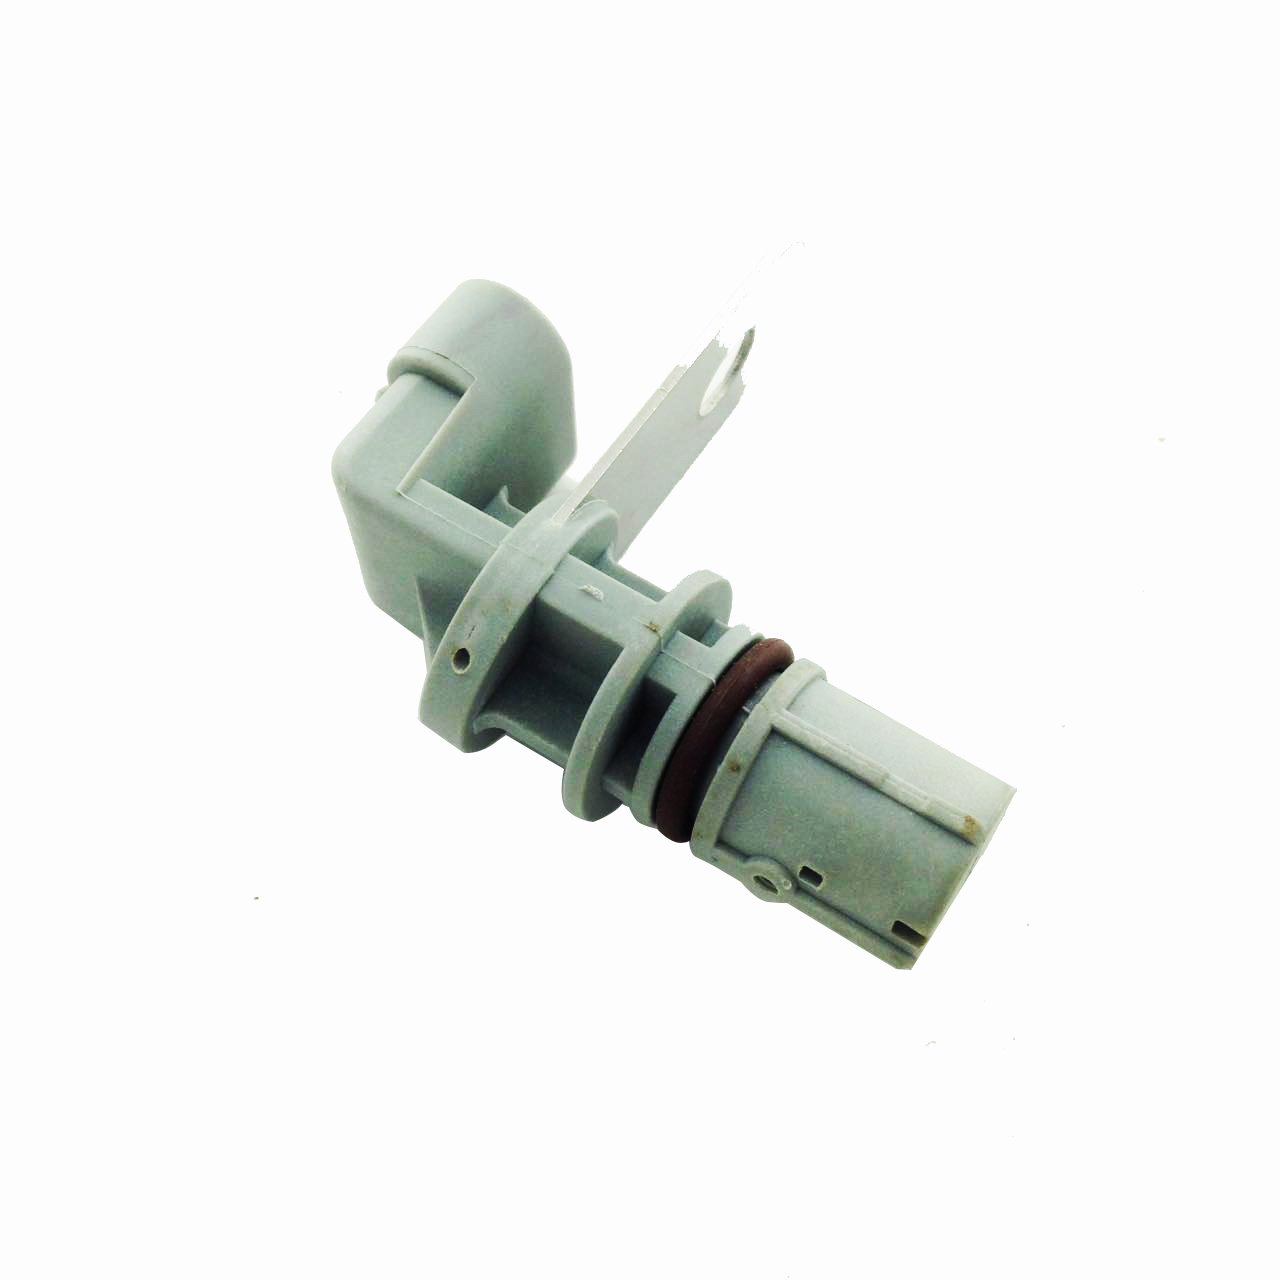 MUCO New 12585546 PC552 Crankshaft Position Sensor Replaces 2009-2013 Chevrolet Express 4500